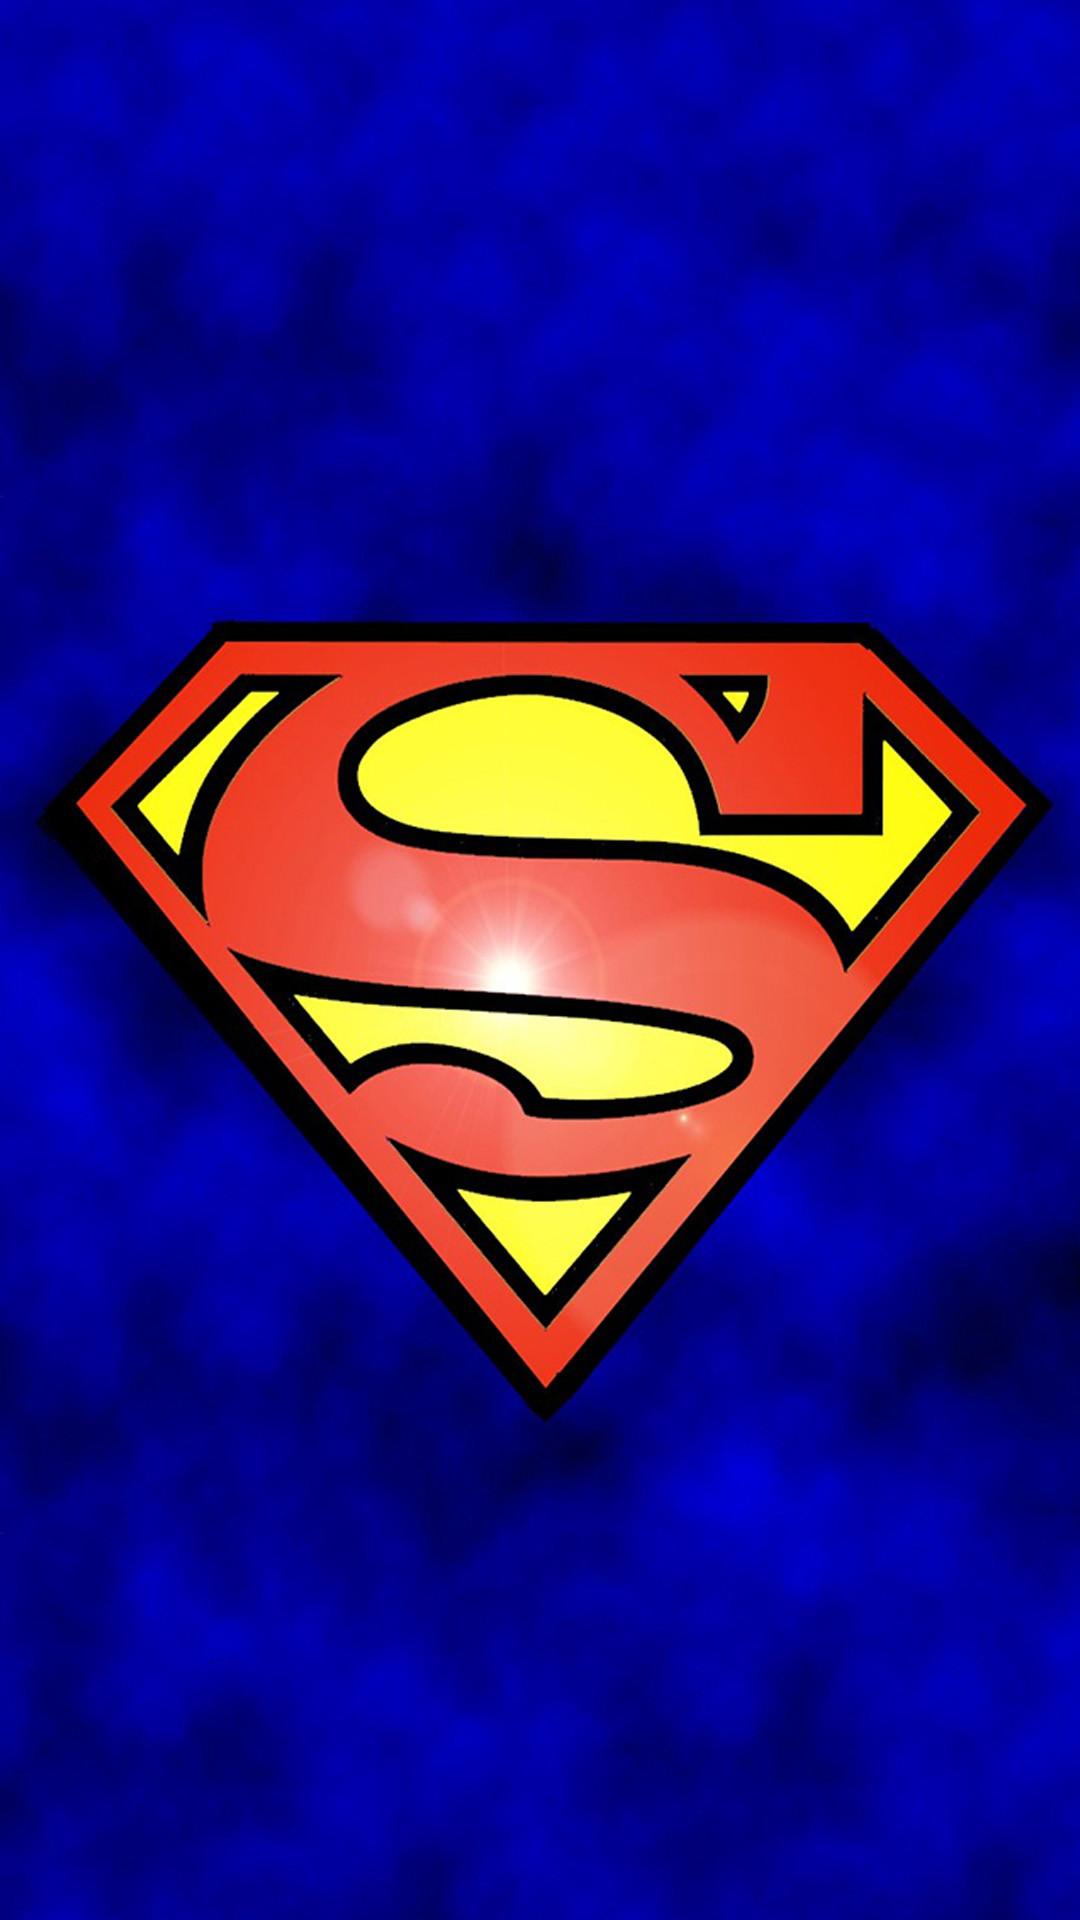 Funny Superman Logo iPhone 6 Wallpaper Download | iPhone Wallpapers .